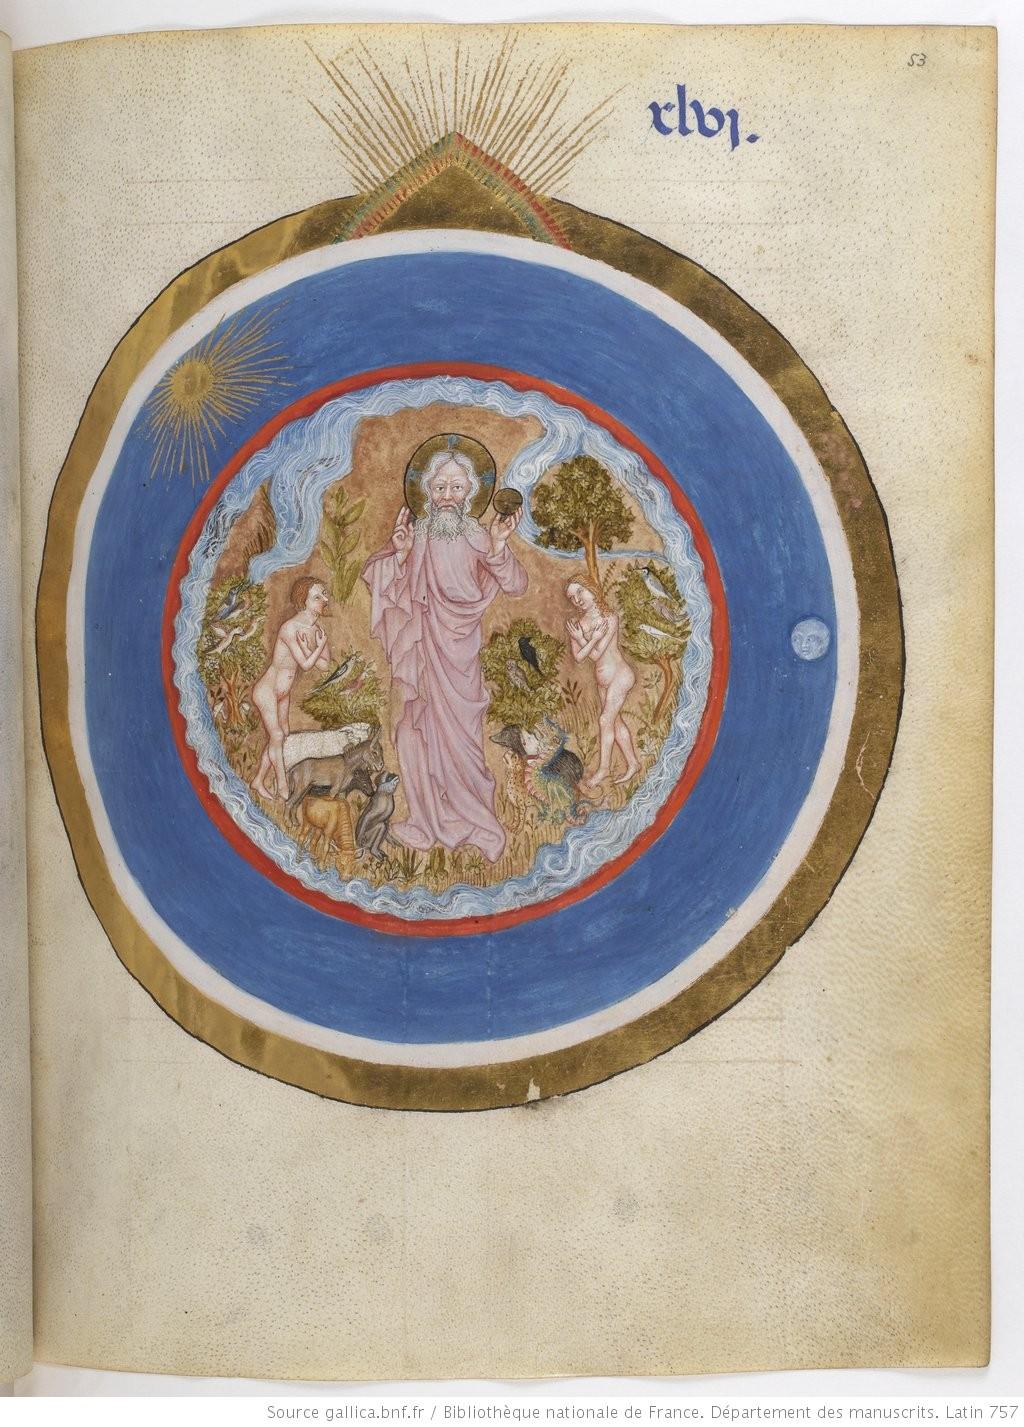 7 Samedi Missel a l'usage des freres mineurs, Lombardie, 1388, Gallica BNF ms. lat. 757, fol. 53r